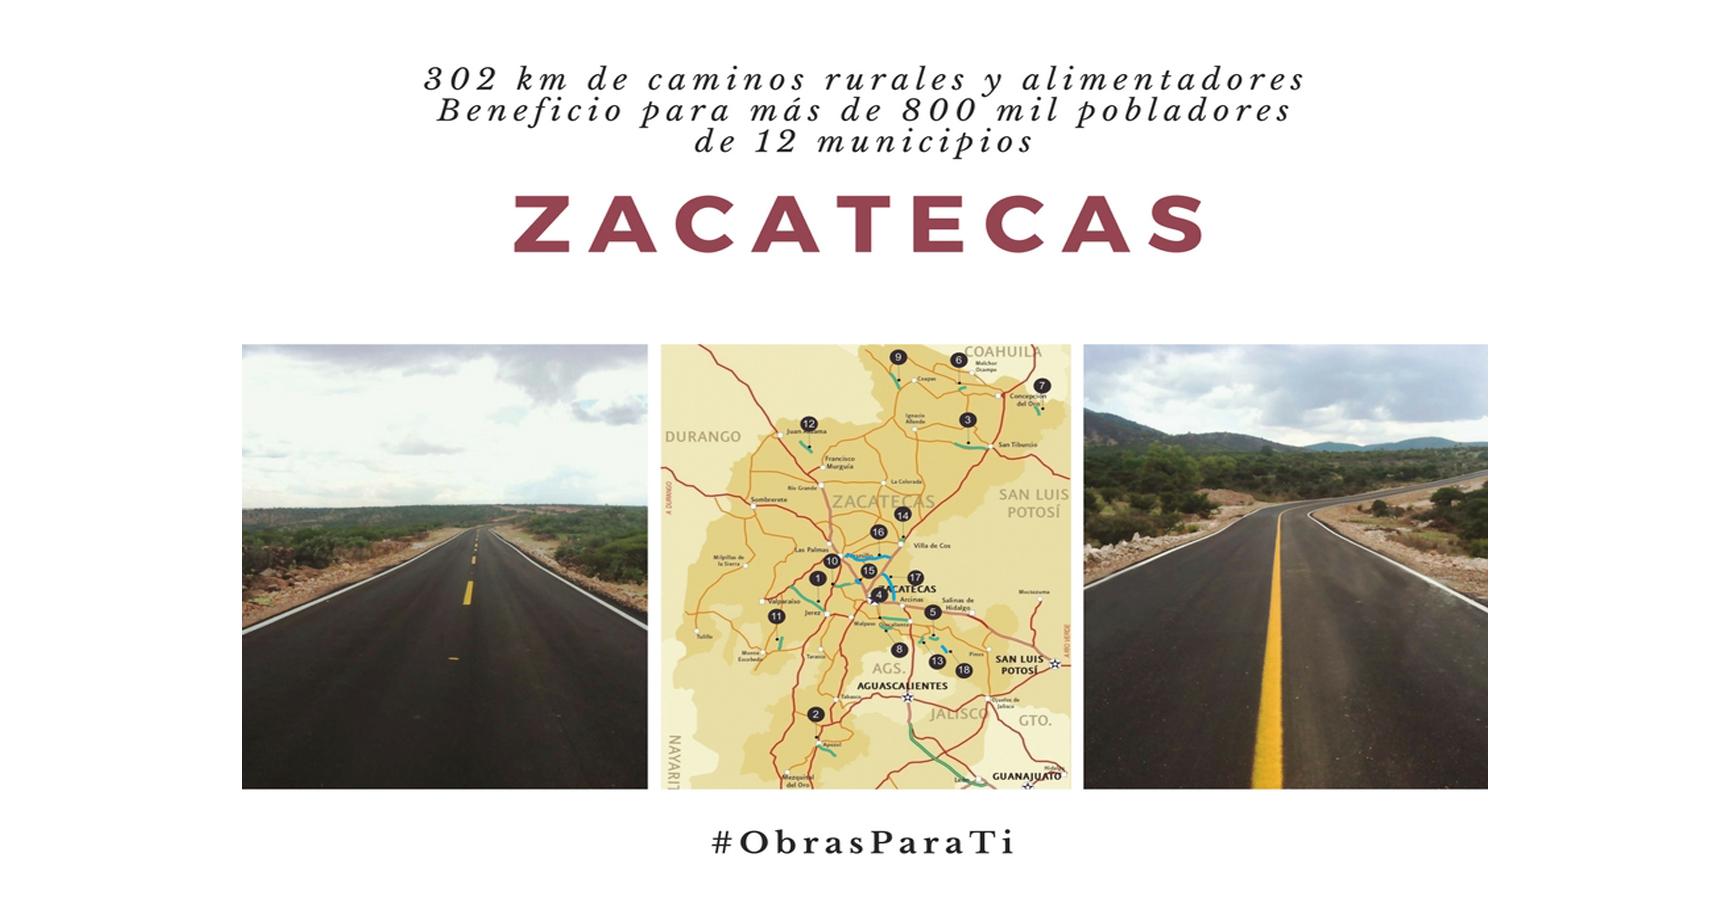 #ObrasParaTi | Infraestructura para Zacatecas